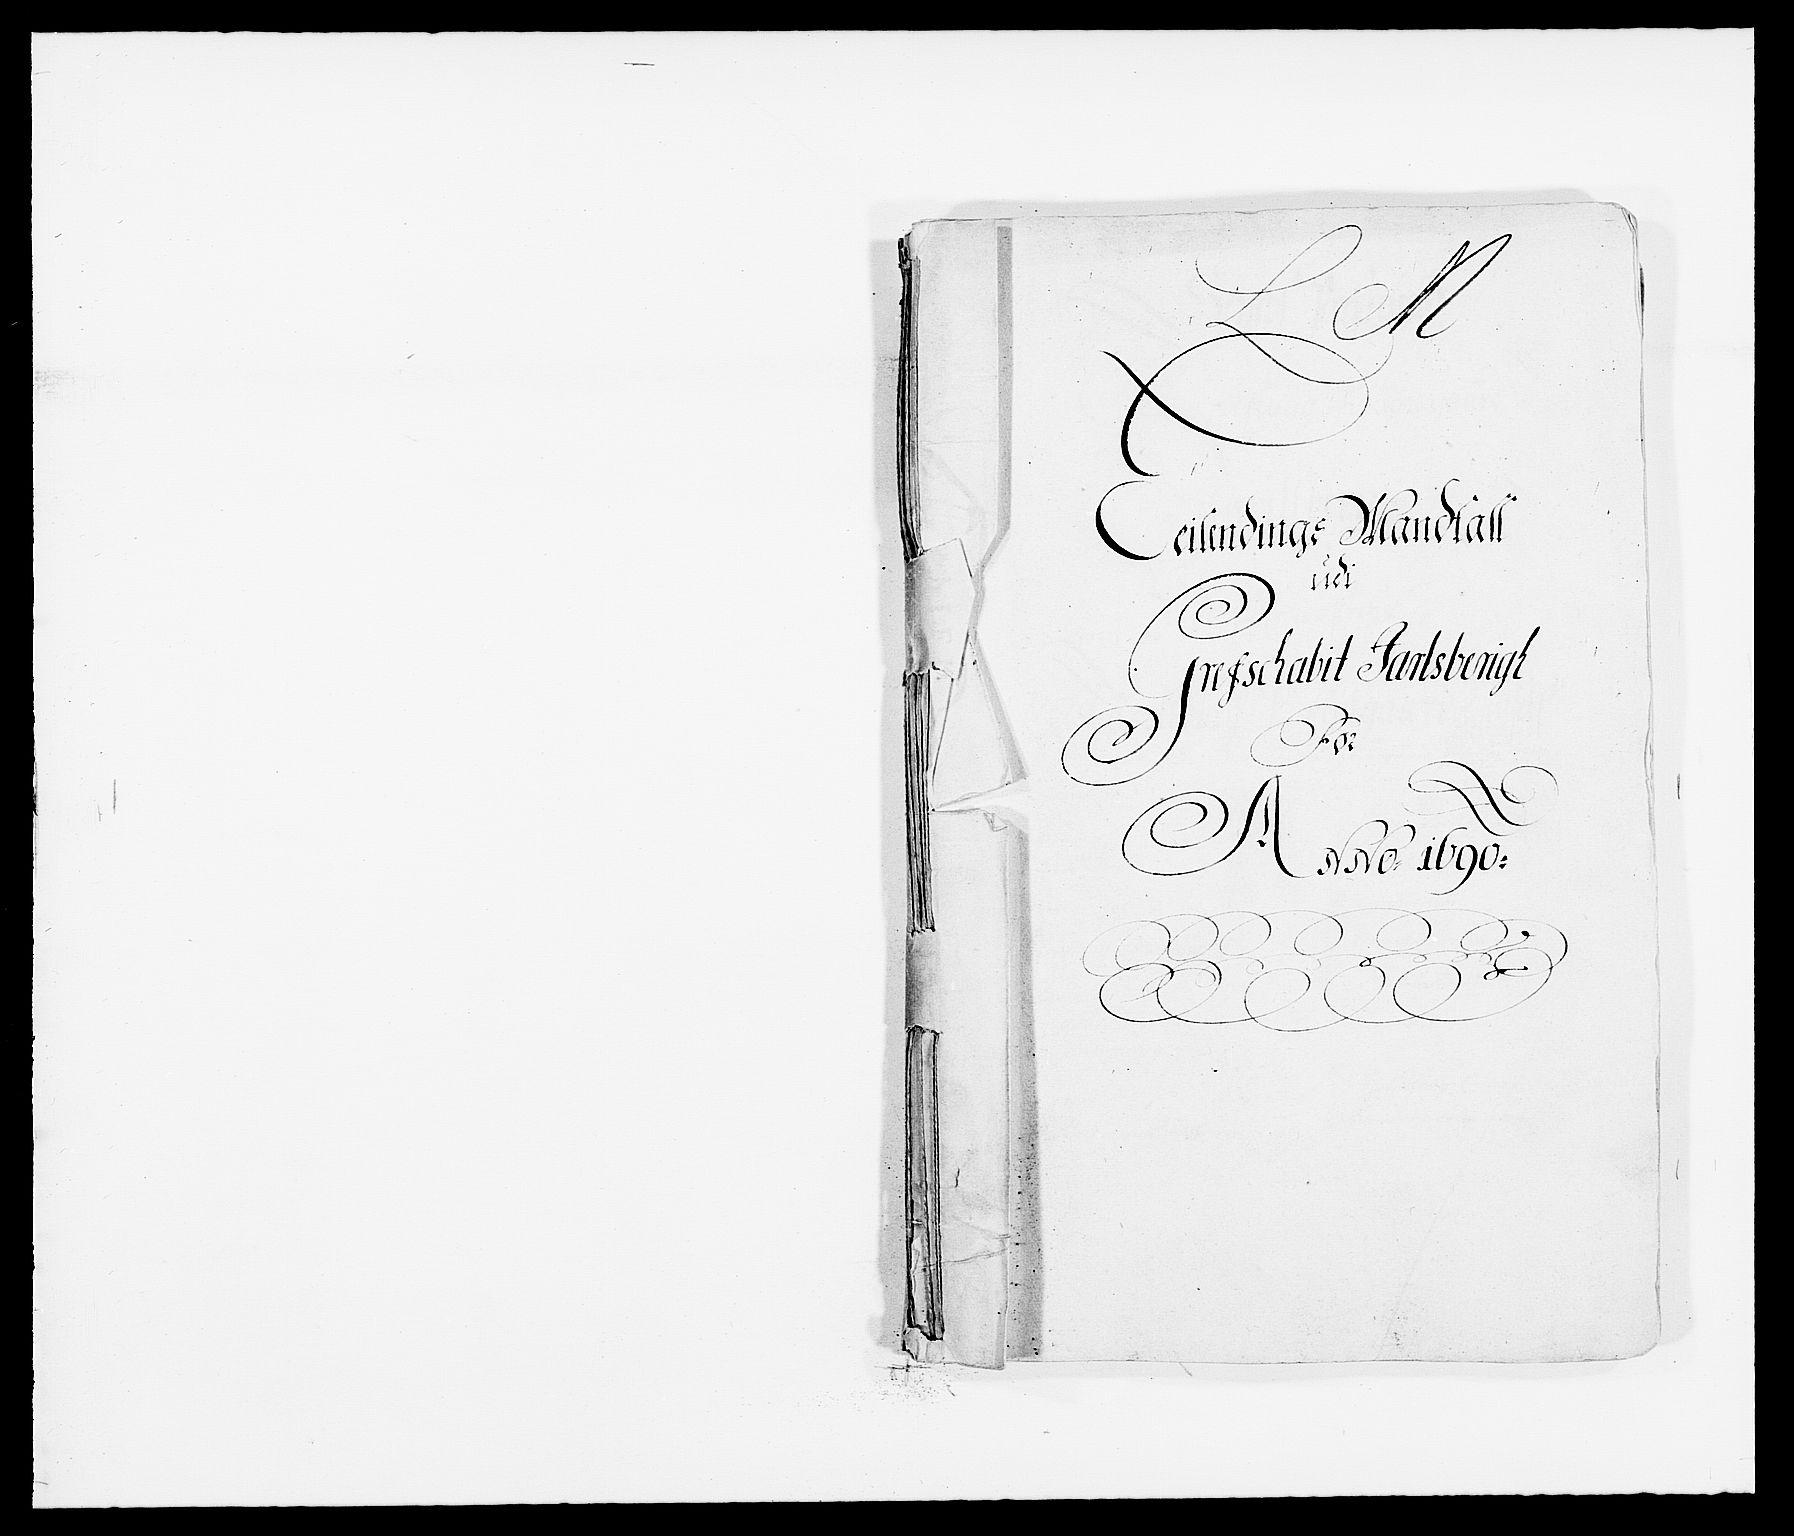 RA, Rentekammeret inntil 1814, Reviderte regnskaper, Fogderegnskap, R32/L1861: Fogderegnskap Jarlsberg grevskap, 1686-1690, s. 1